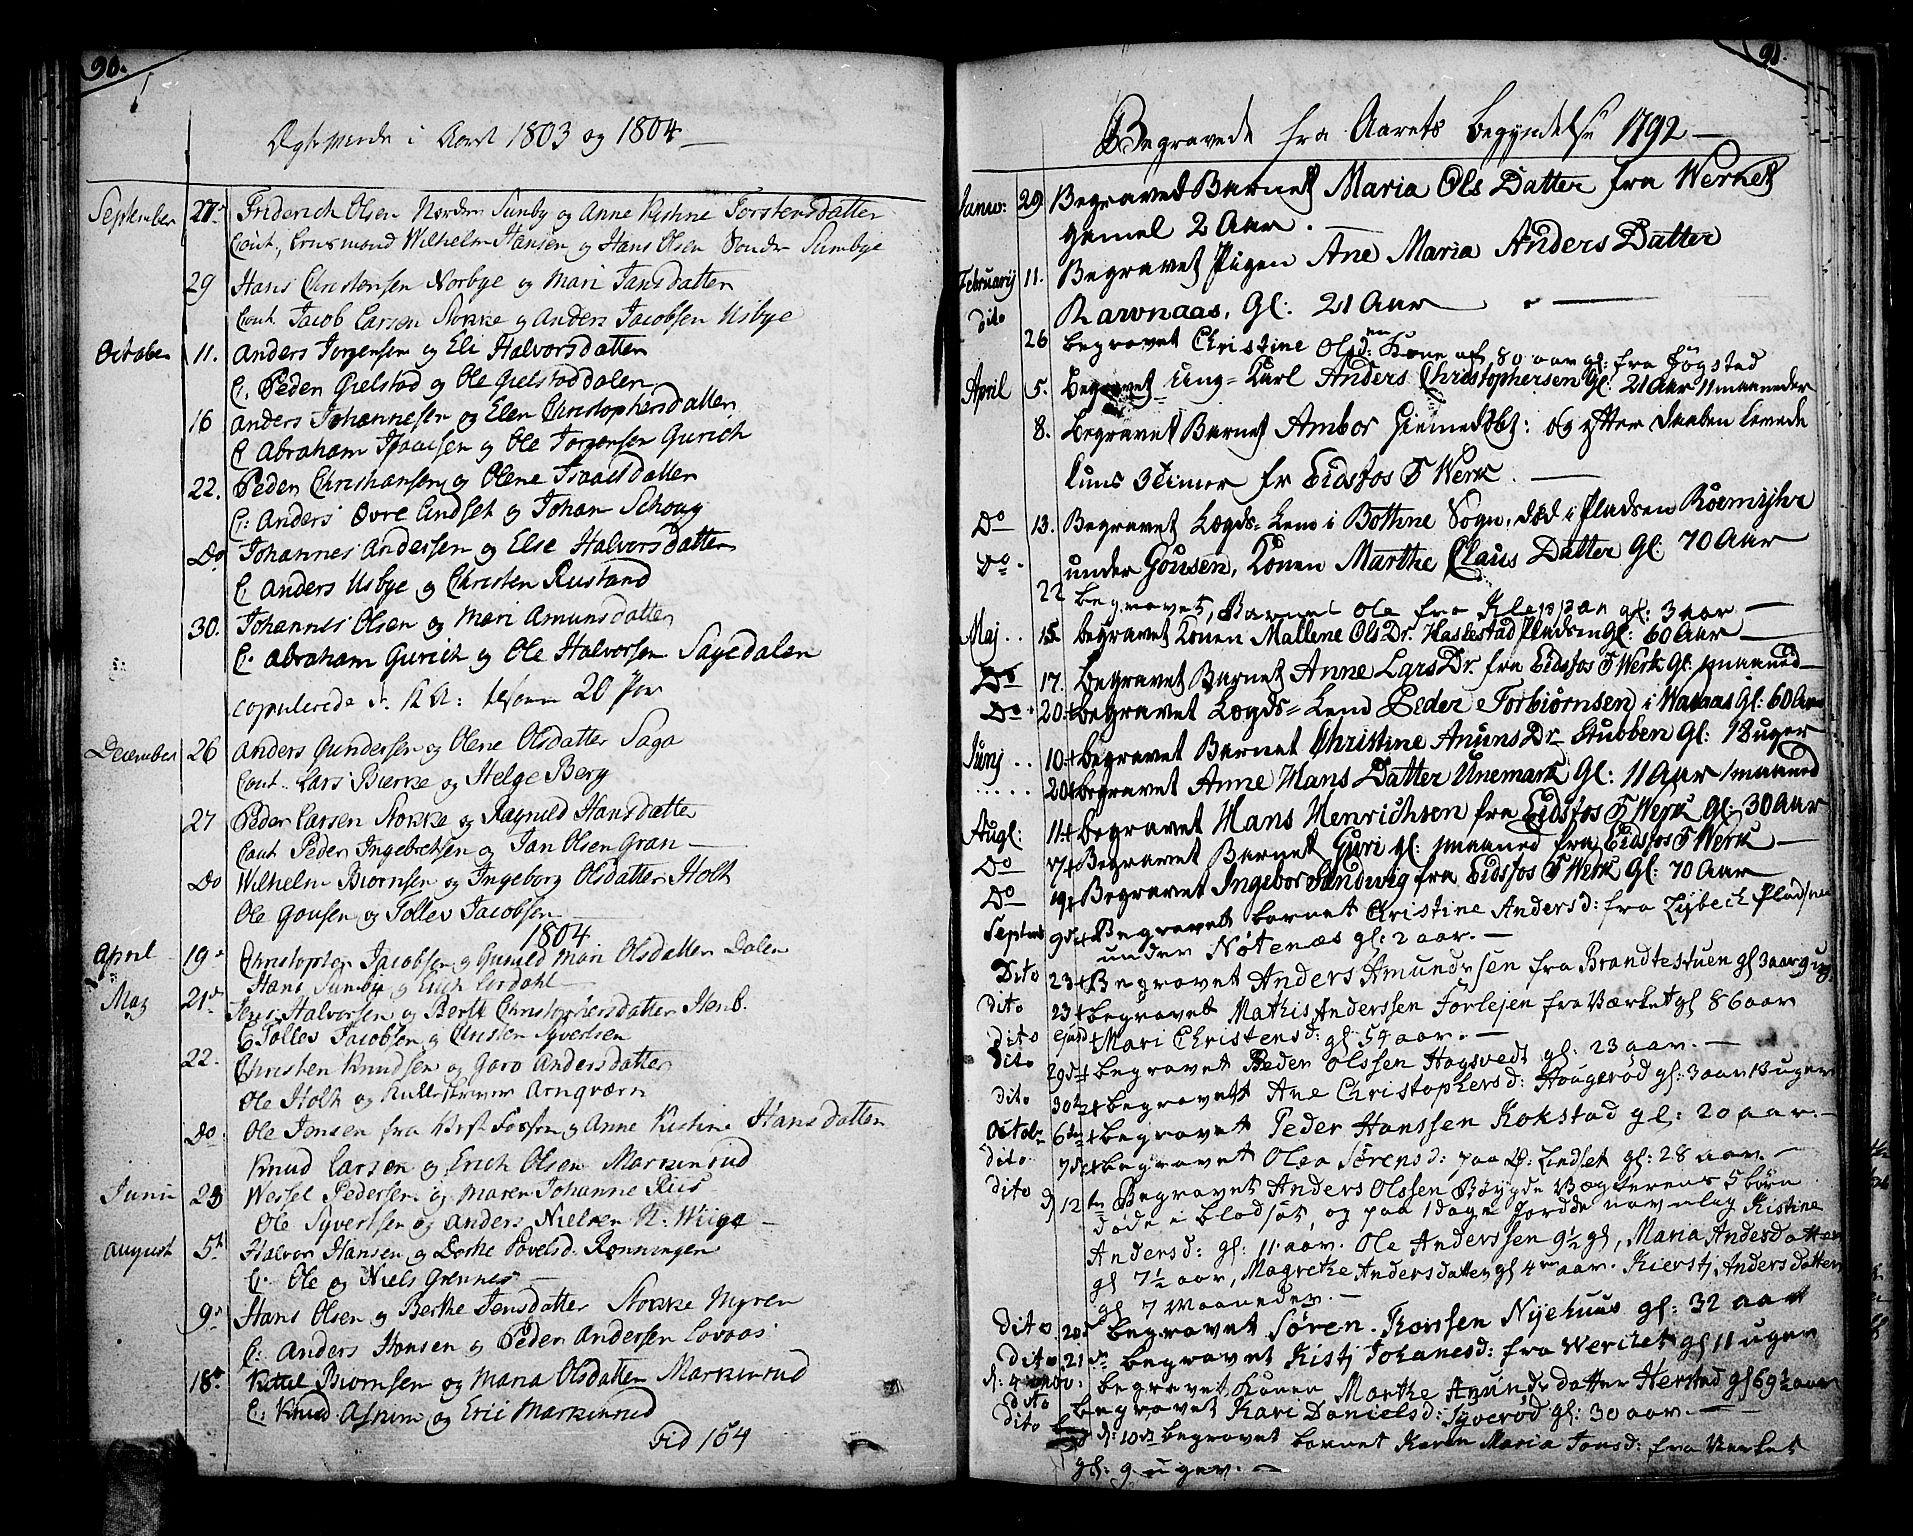 SAKO, Hof kirkebøker, F/Fa/L0003: Ministerialbok nr. I 3, 1782-1814, s. 90-91